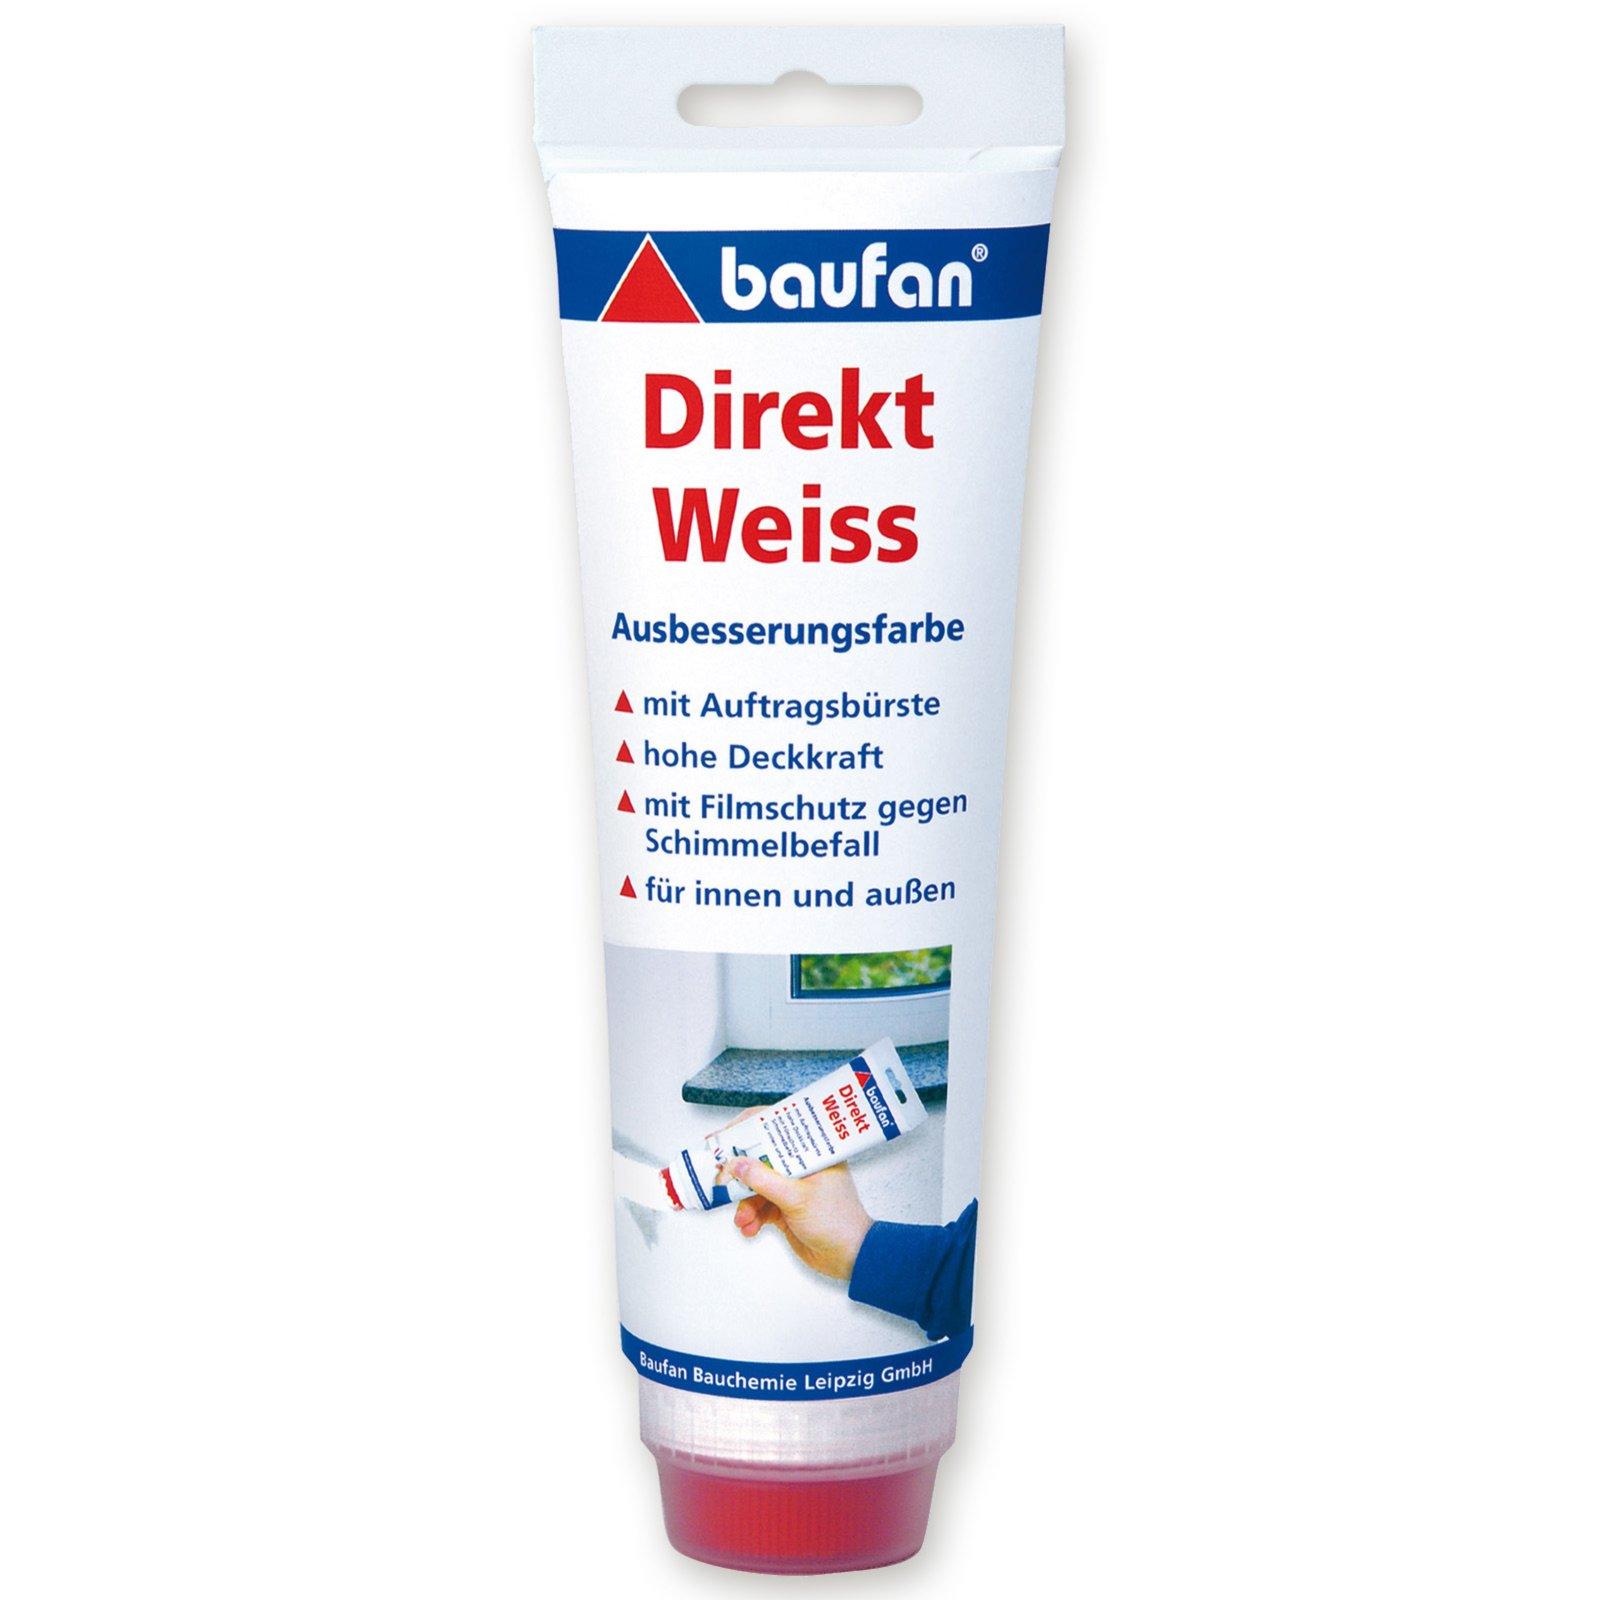 Direkt-Weiss - Ausbesserungsfarbe - 250 ml